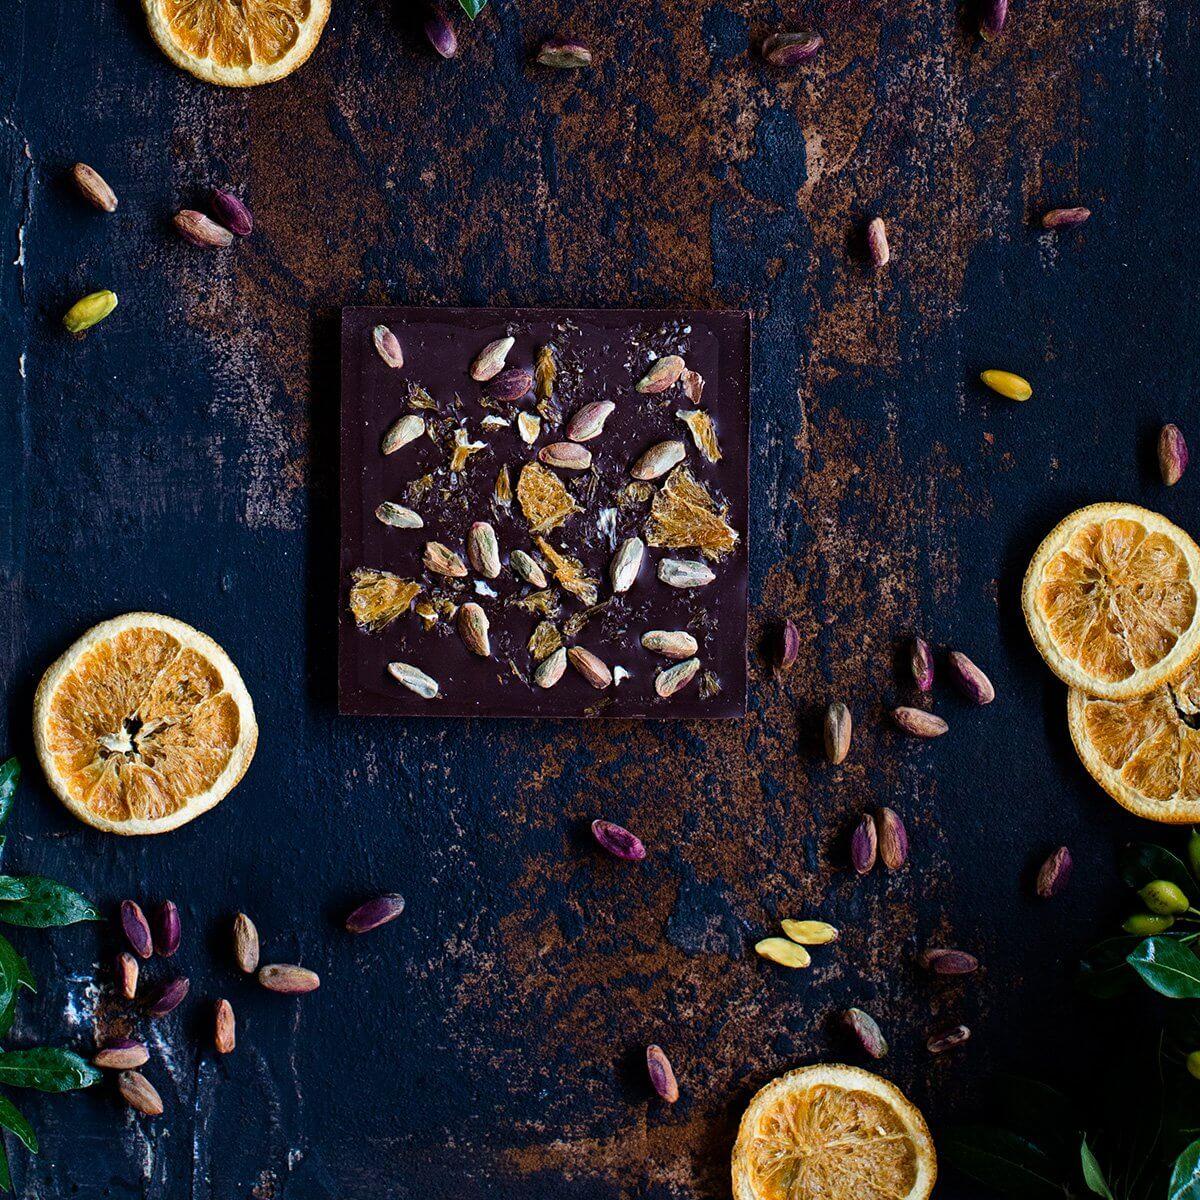 MI'Cao Portakal & Fıstık Bitter Çikolata Tablet 70GR